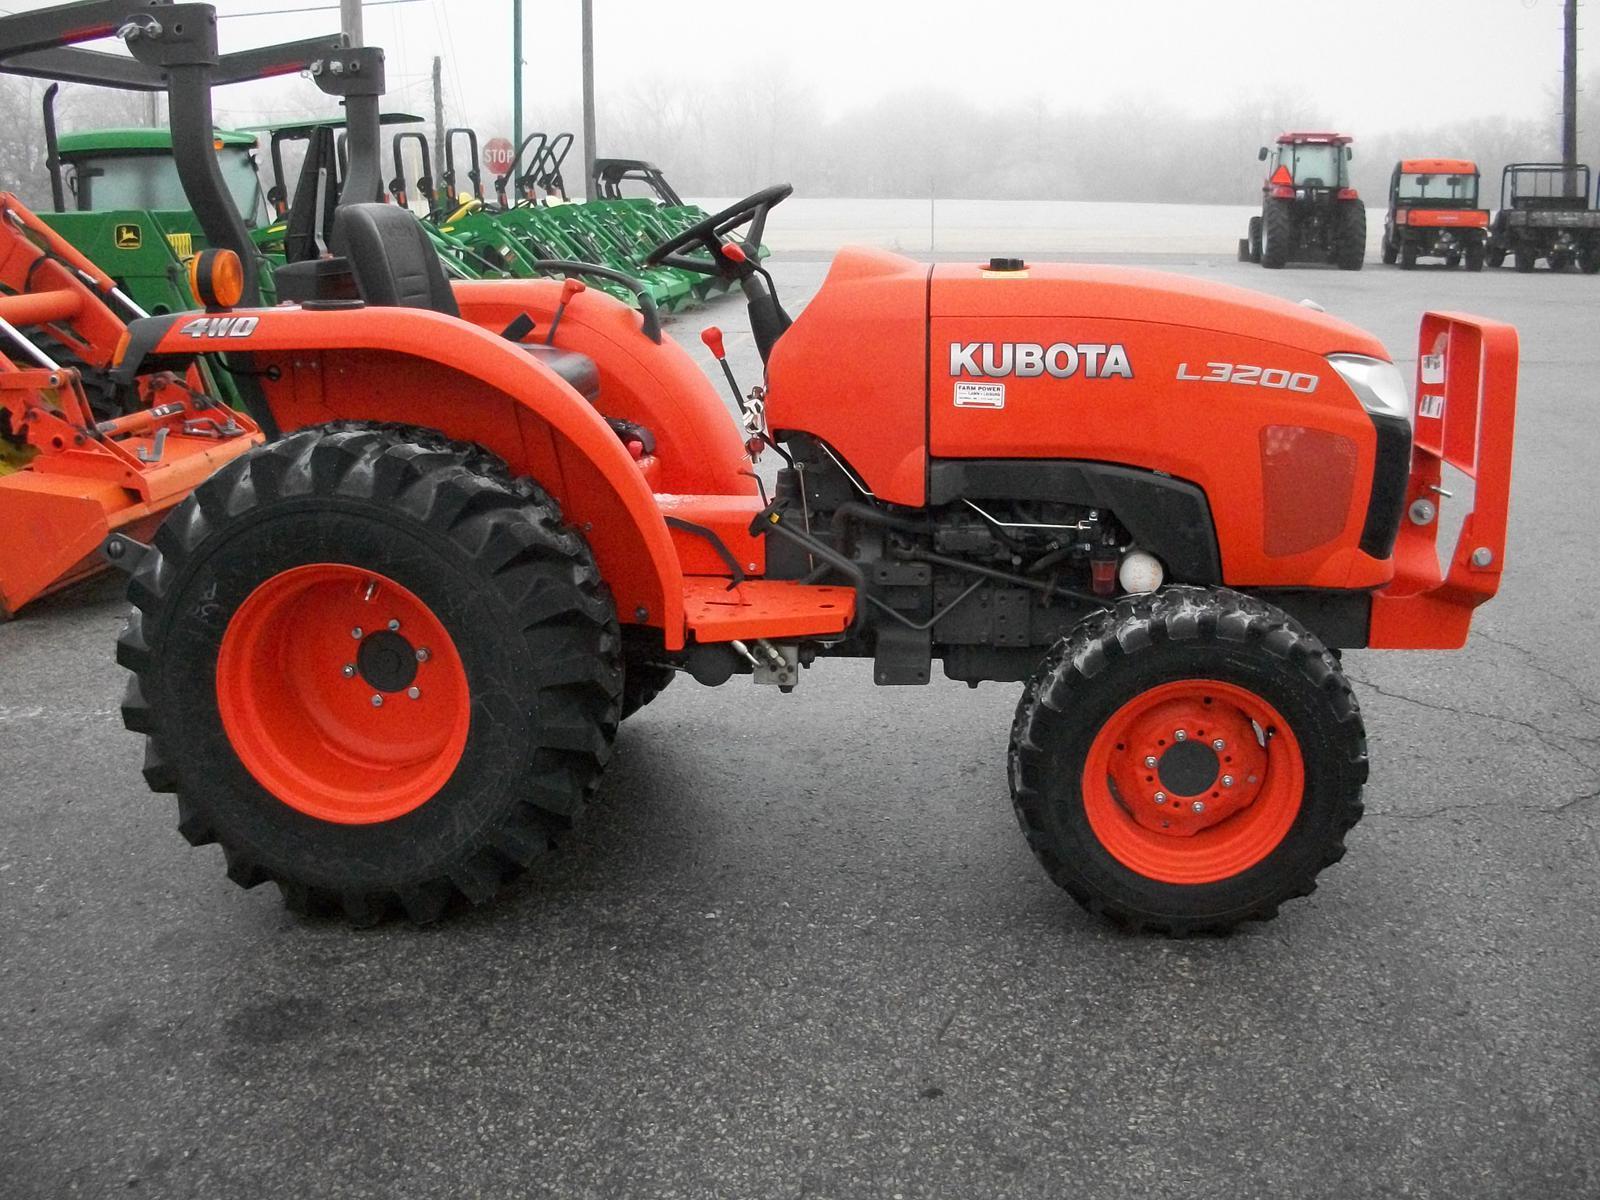 hight resolution of l kubota tractor wiring diagram detailed schematic diagrams jpg 1600x1200 2013 kubota l3800